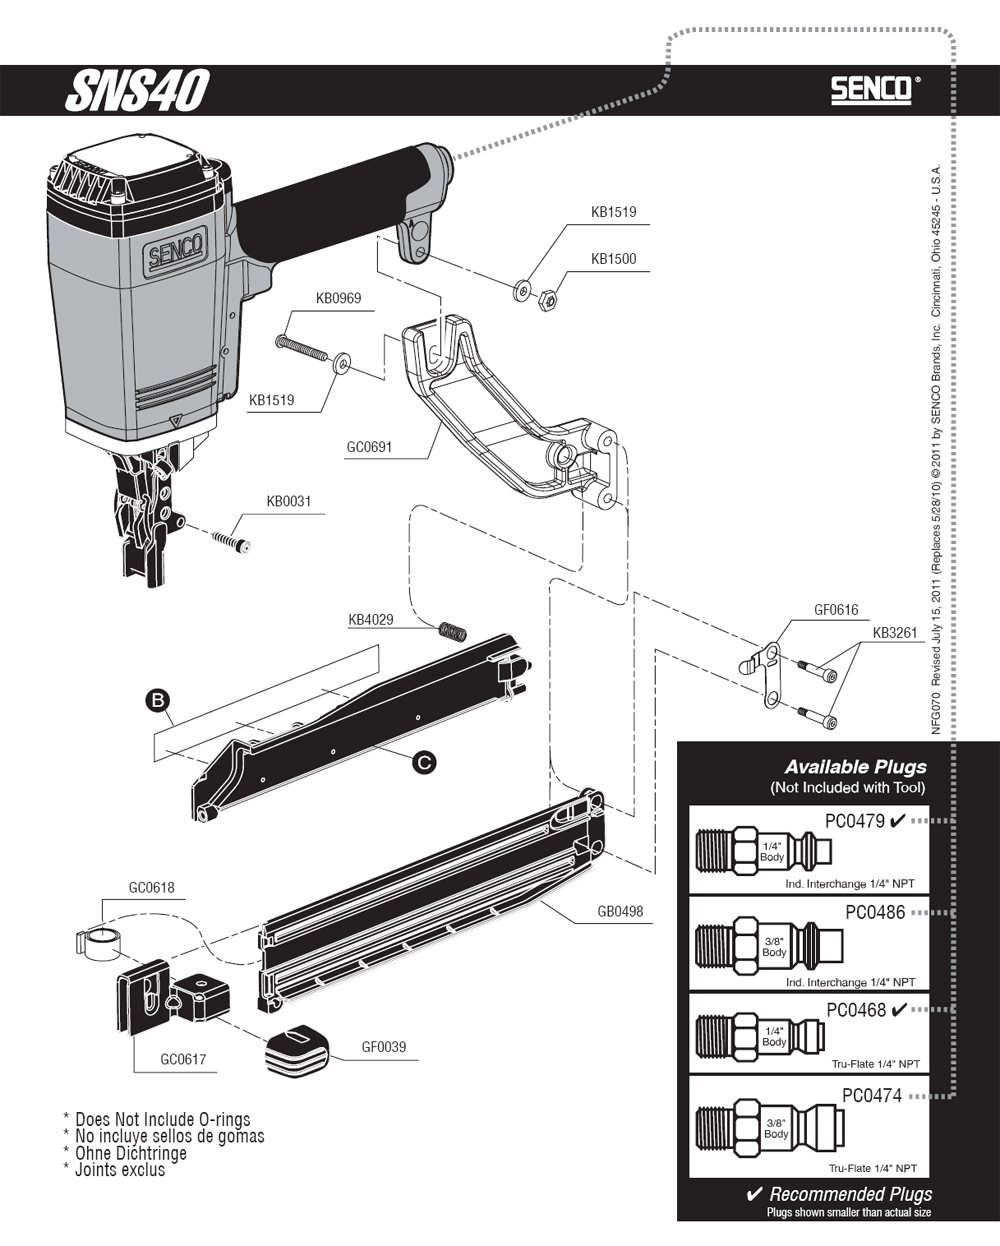 700001N-senco-PB-1Break Down